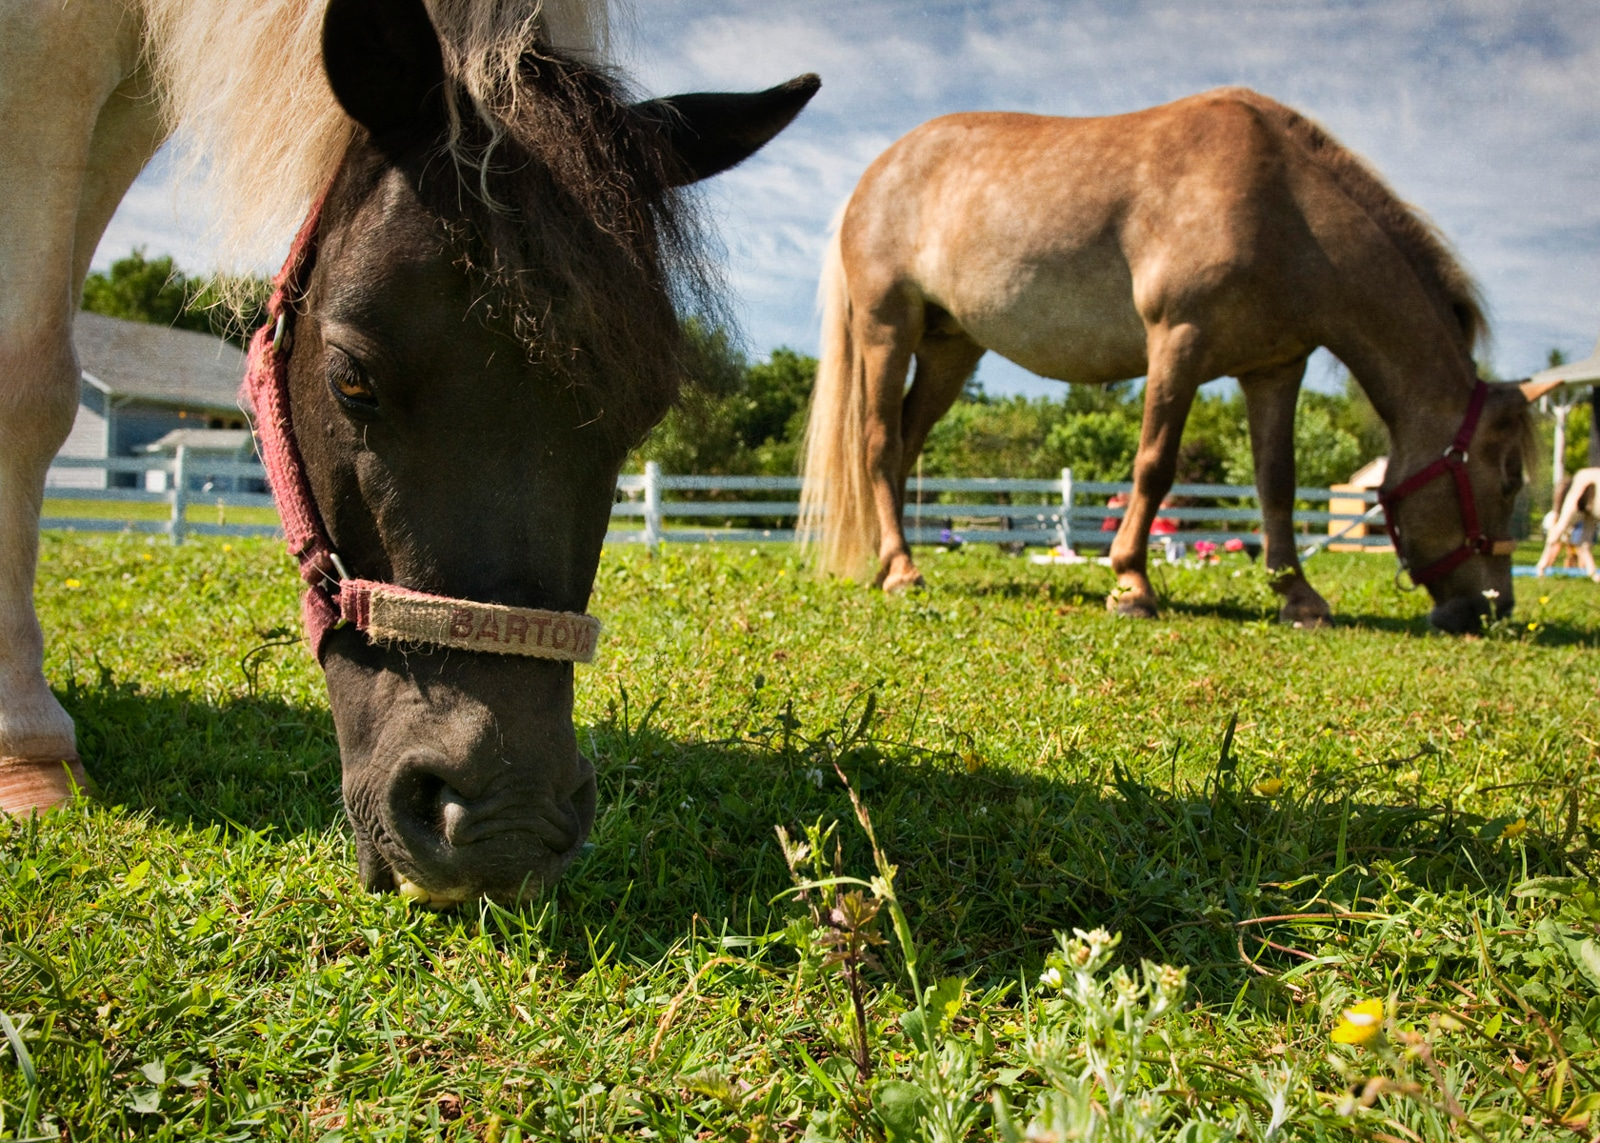 Mini Horses grazing